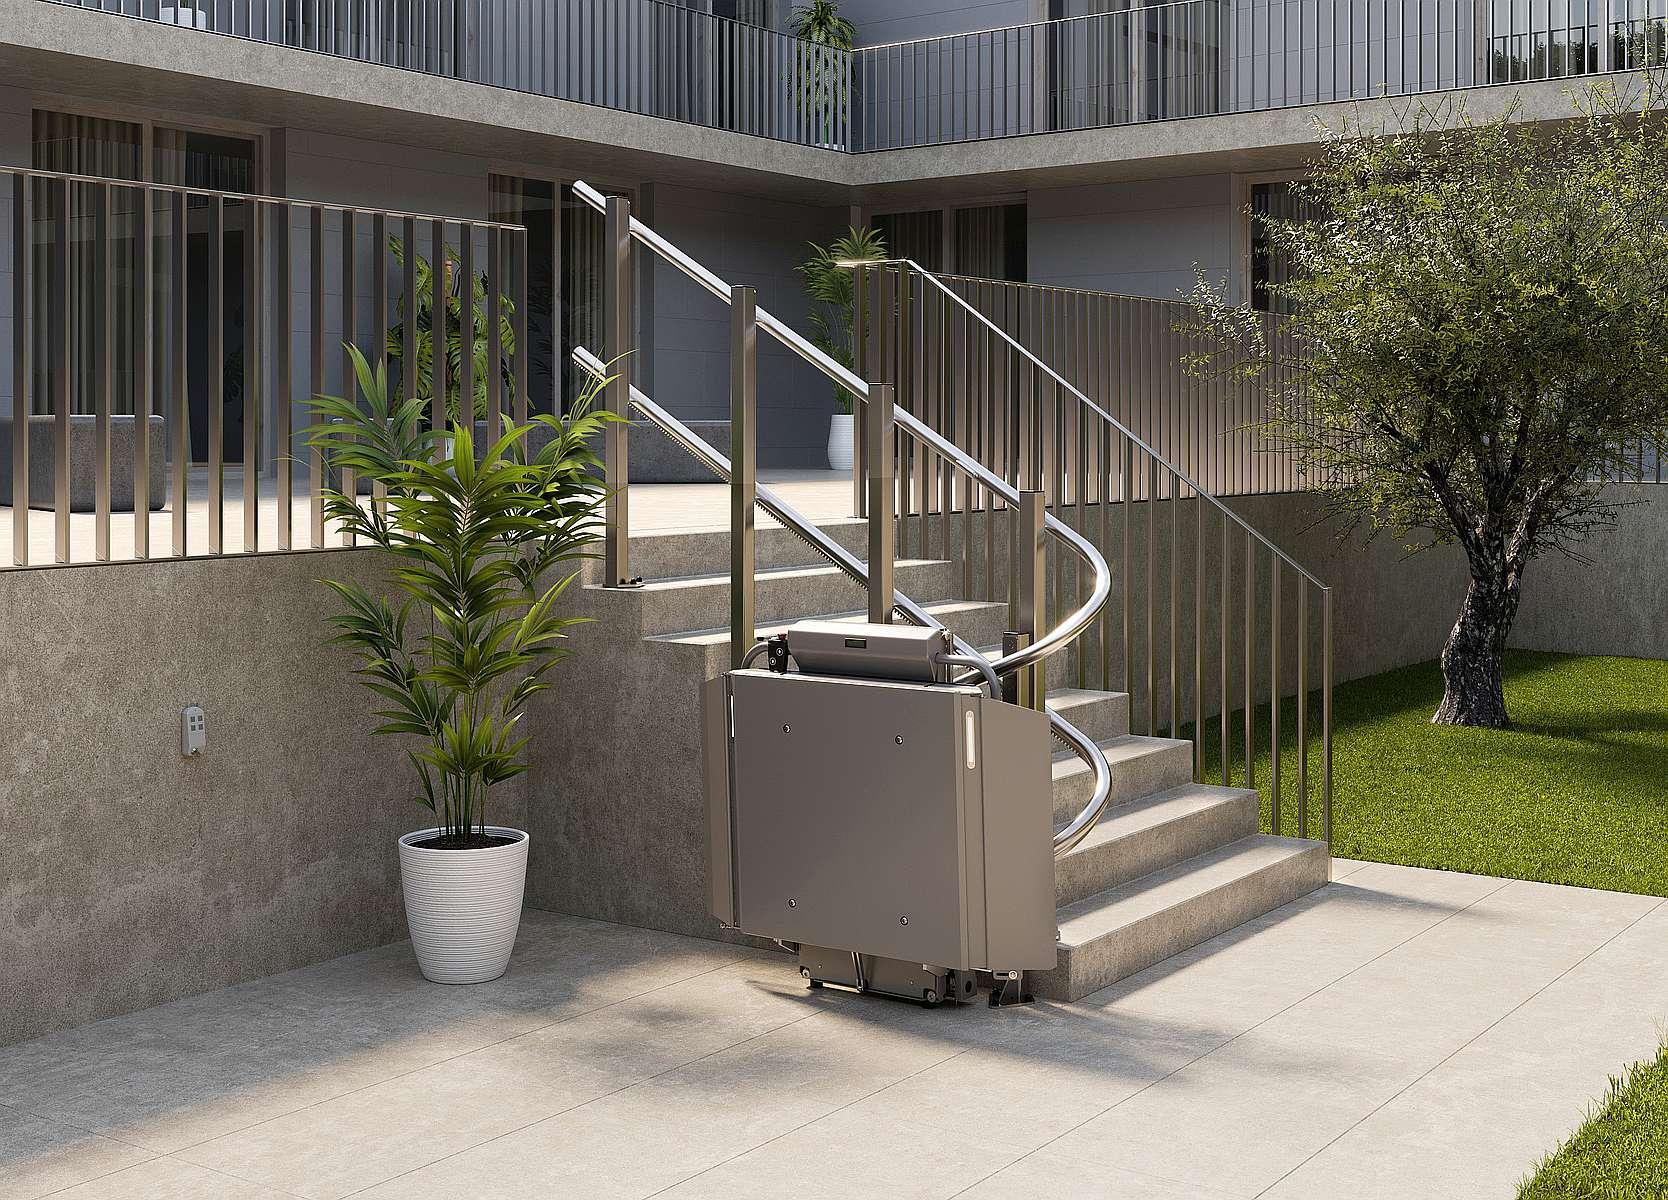 Plate-forme monte-escalier Stratos